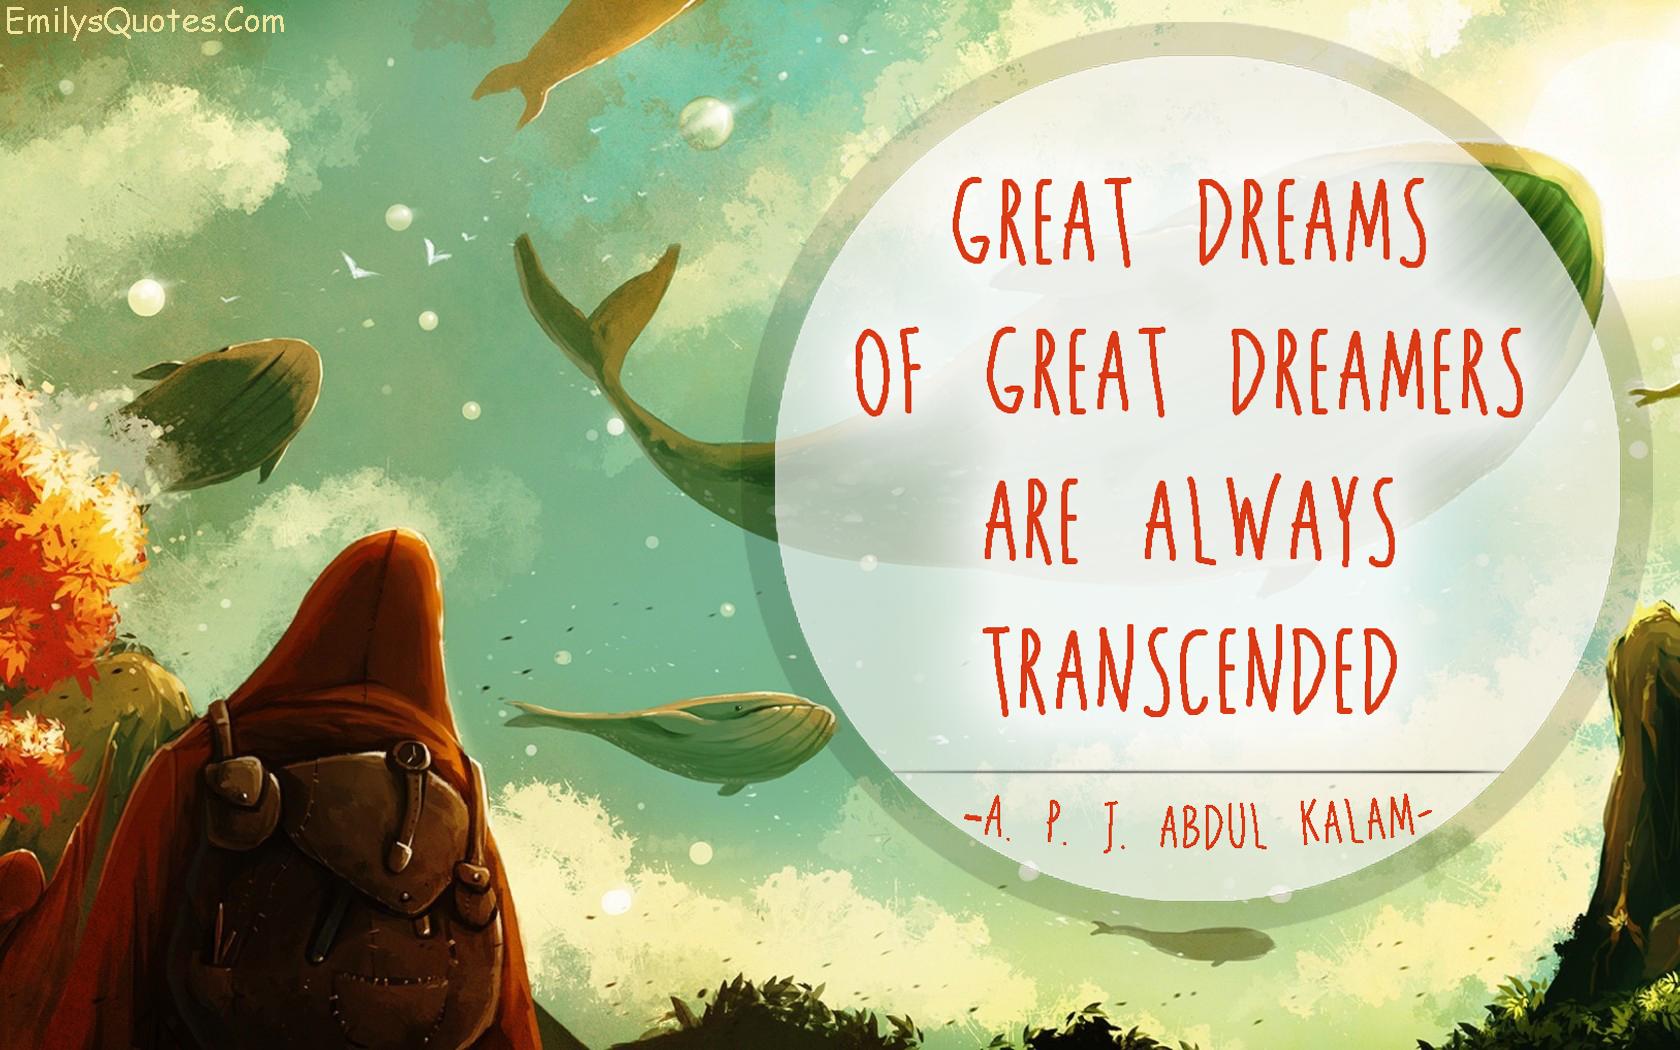 EmilysQuotes.Com - great, dreams, inspirational, transcended, A. P. J. Abdul Kalam